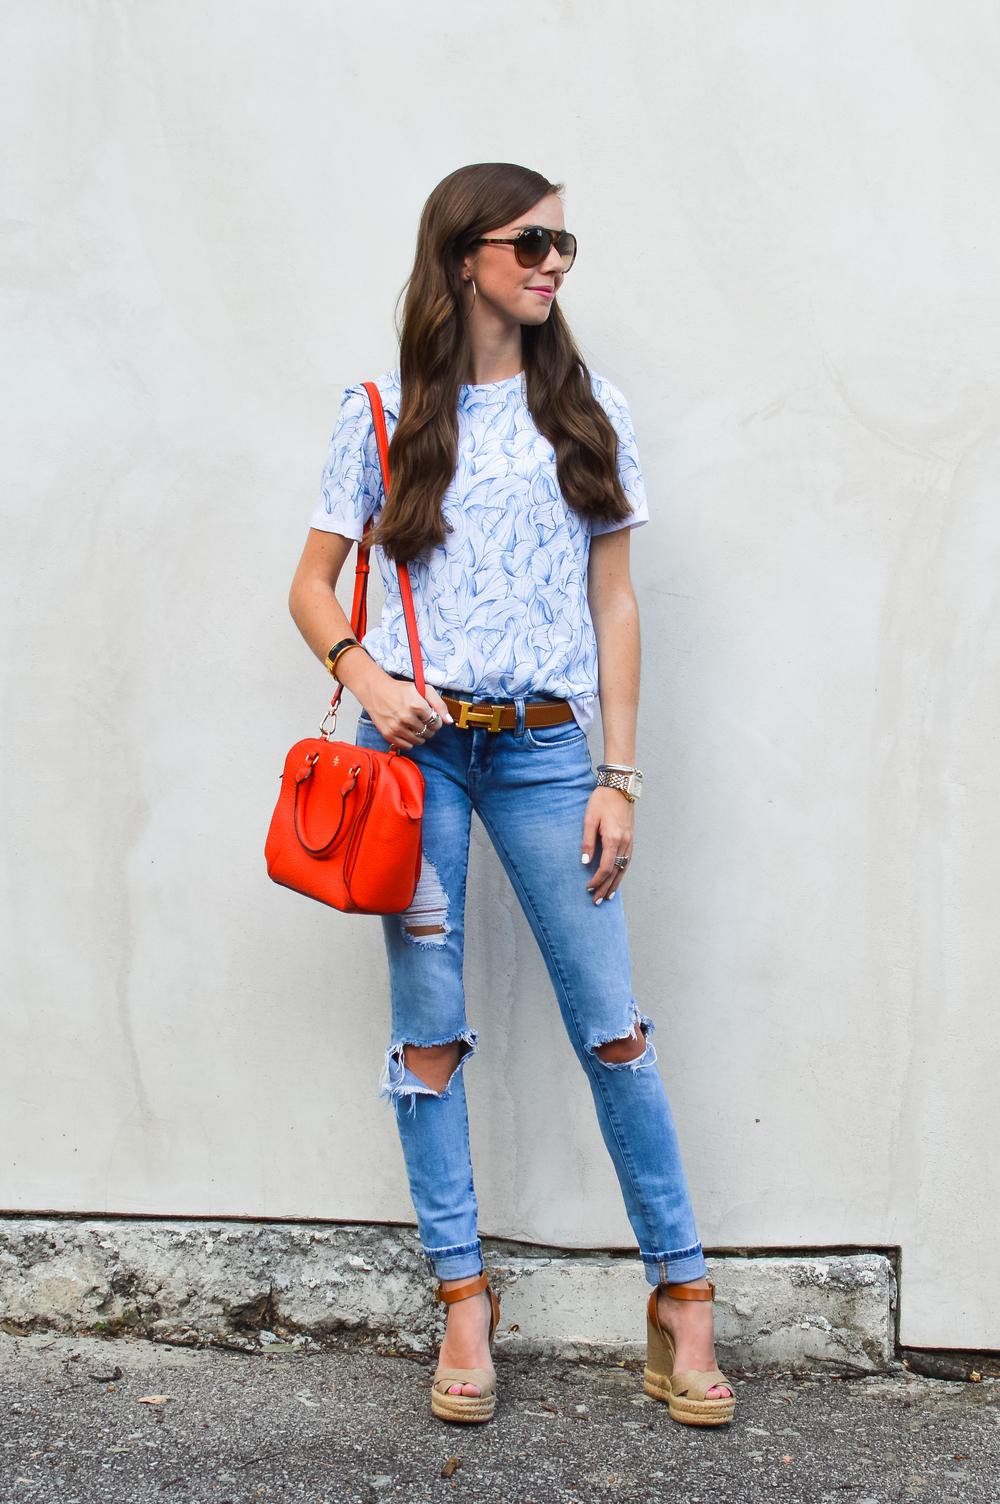 lcb_style_fashion_blogger_tory burch top (9 of 29).jpg